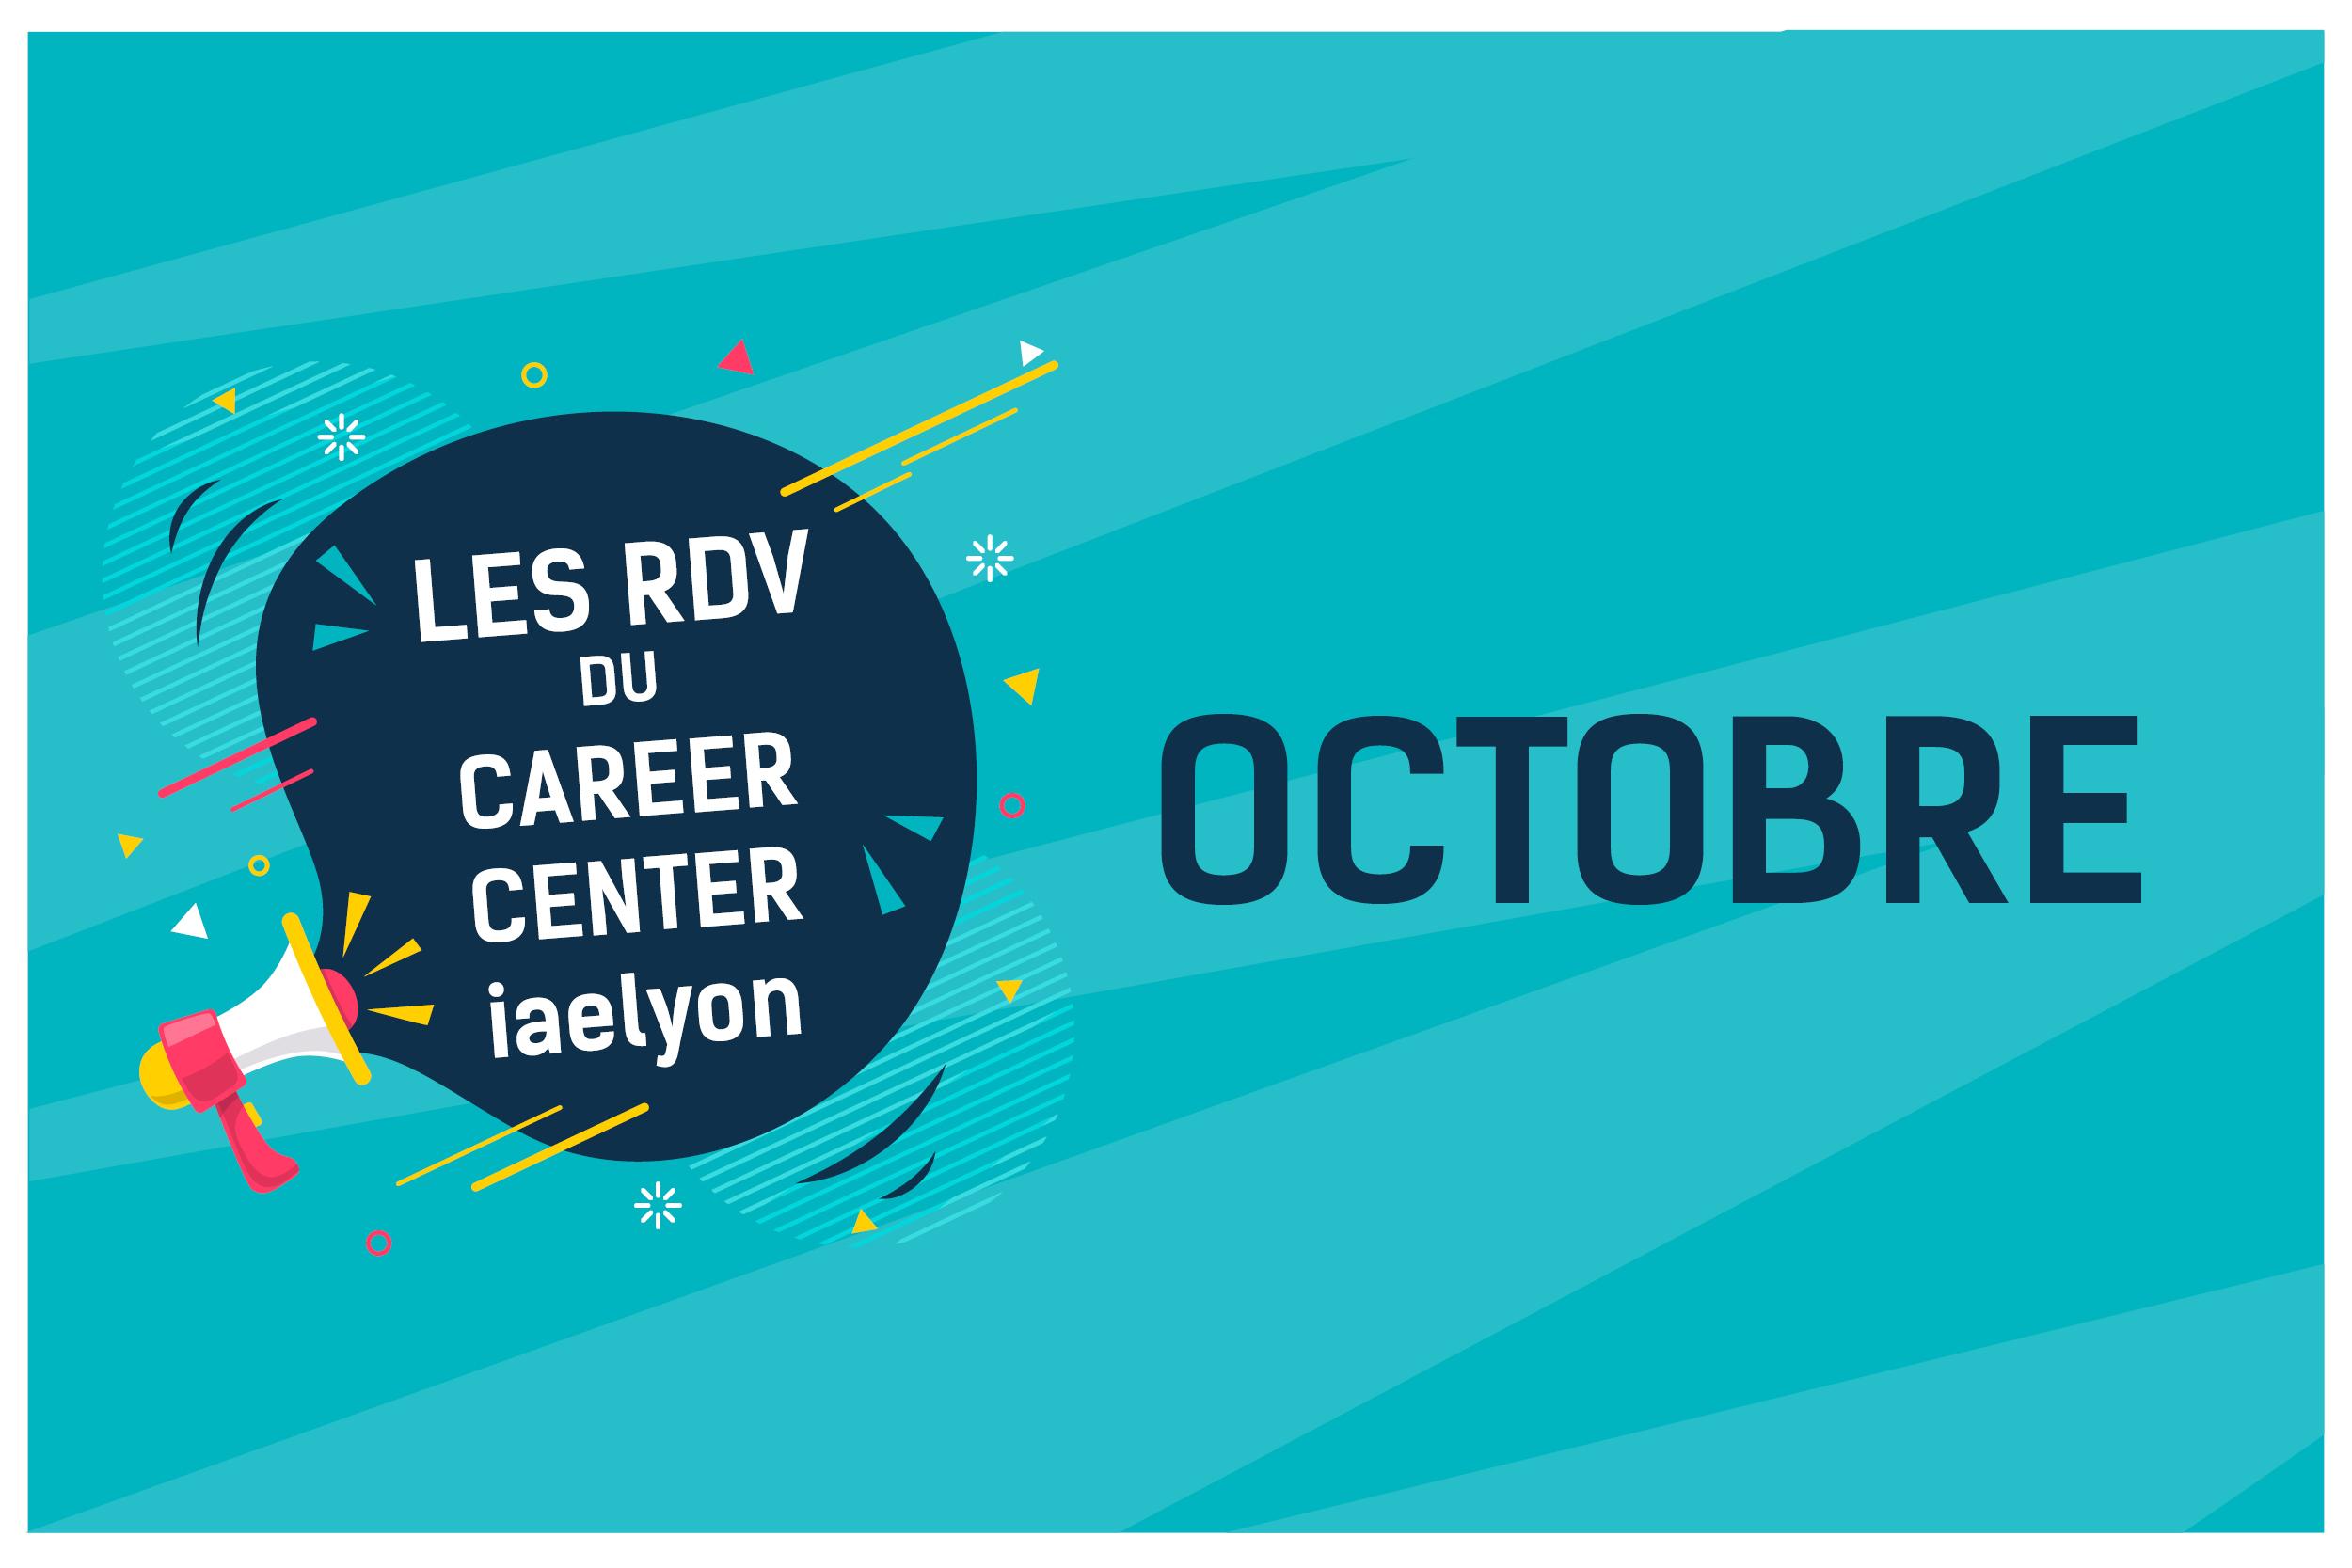 Career Center - Octobre